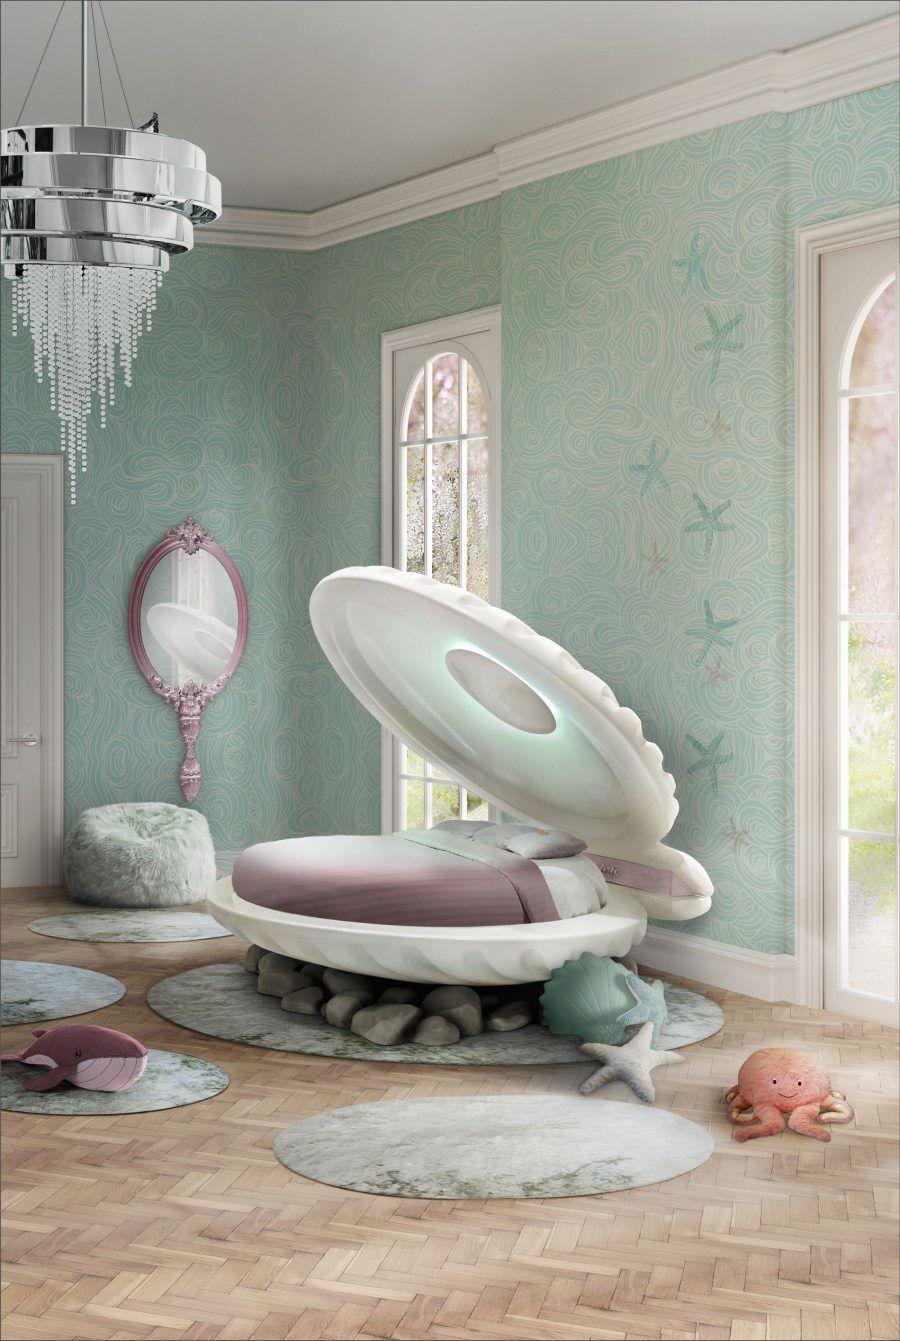 mermaid-bed-01-ambience-circu-magical-furniture-jpg